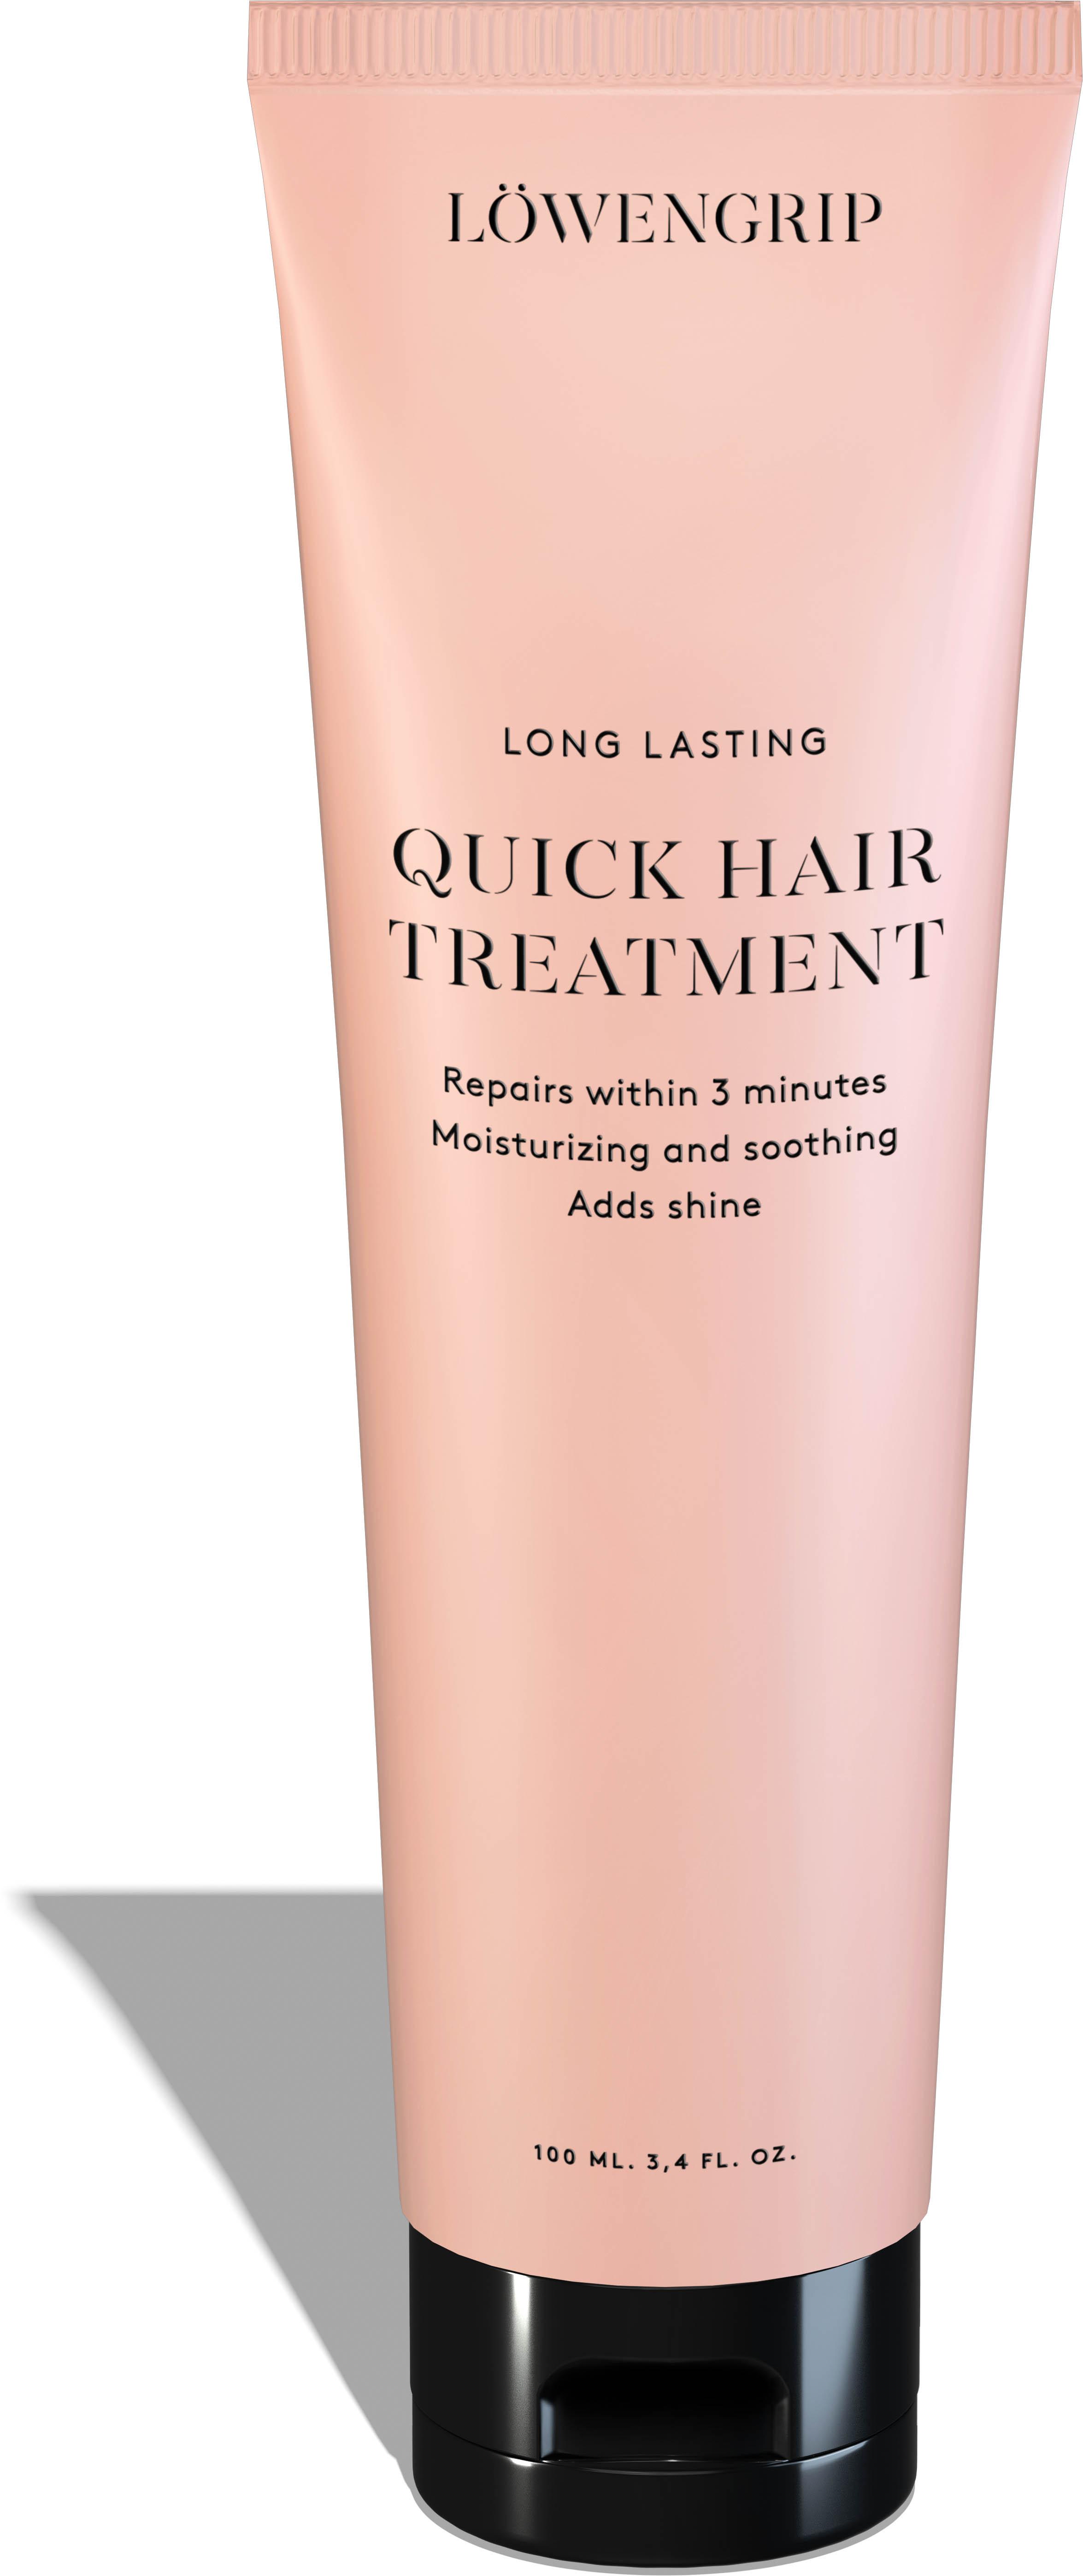 Long Lasting - Quick Hair Treatment 100ml